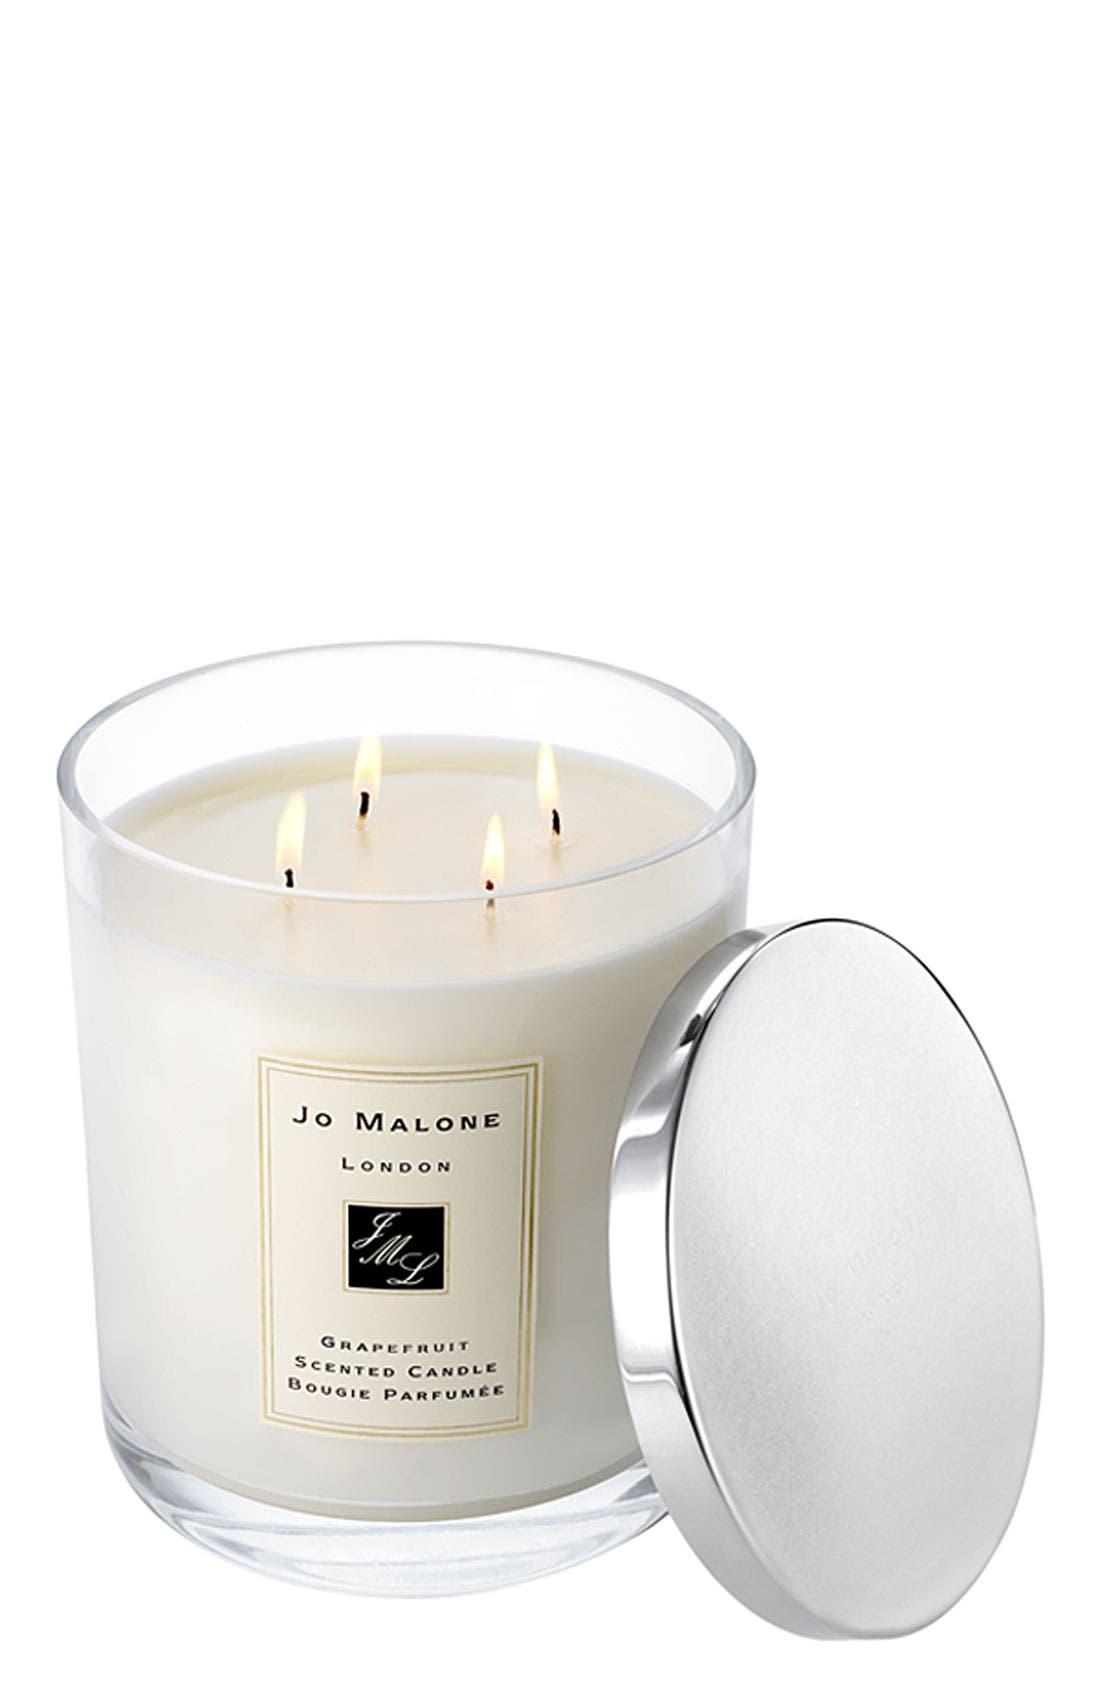 Alternate Image 1 Selected - Jo Malone™ 'Grapefruit' Luxury Candle